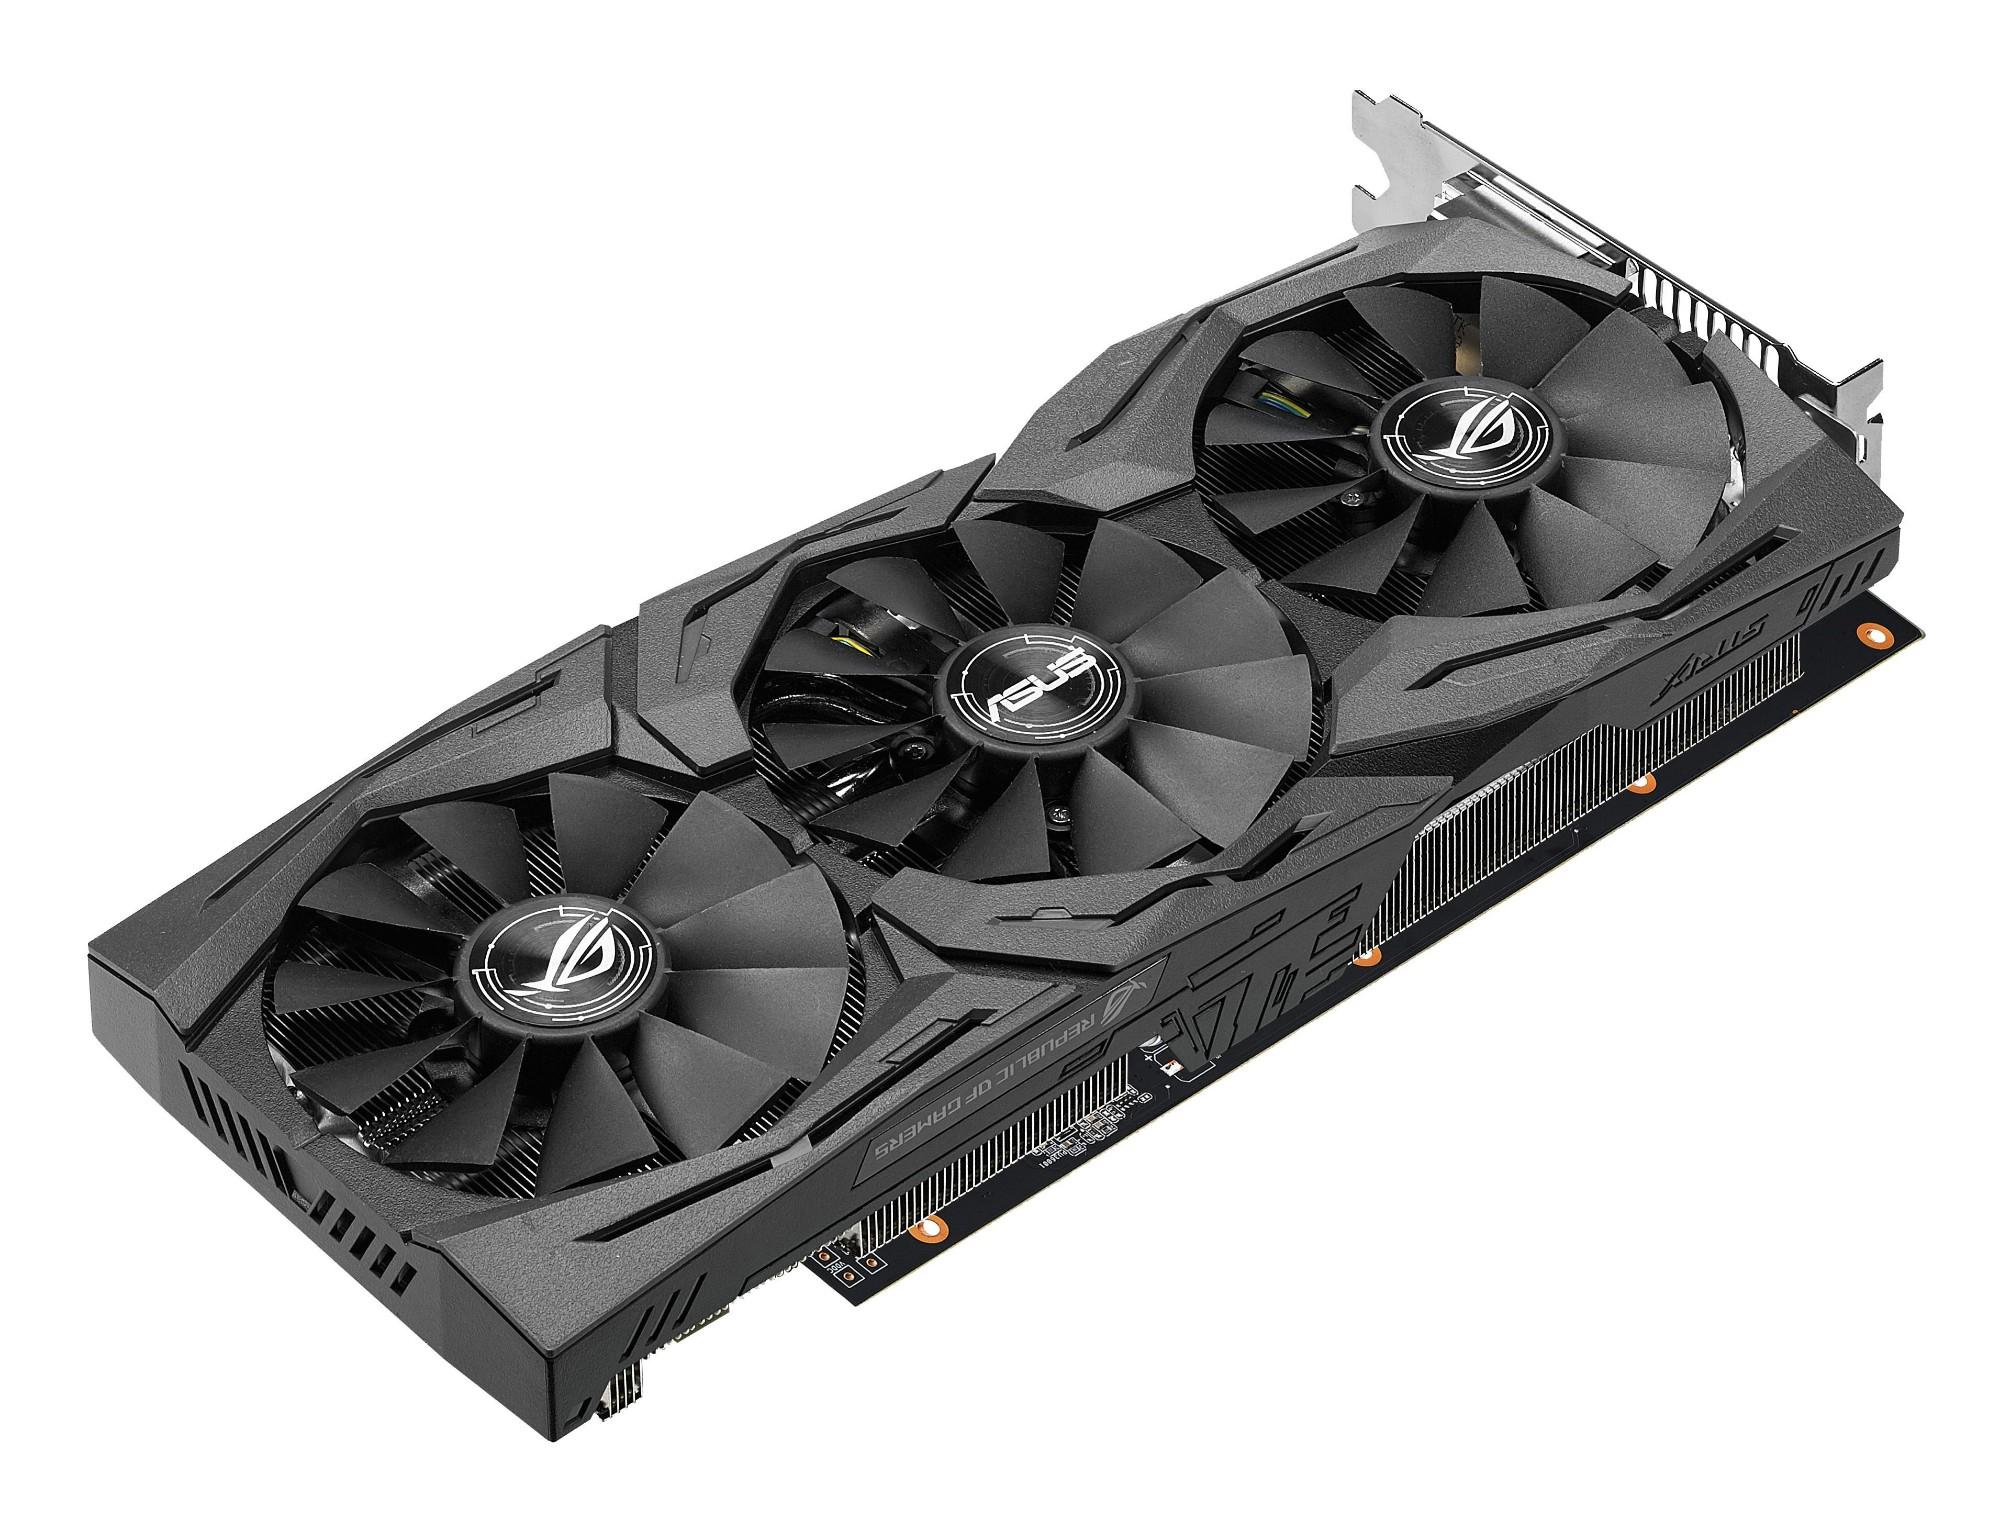 ASUS ROG STRIX-RX480-8G-GAMING Radeon RX 480 8GB GDDR5